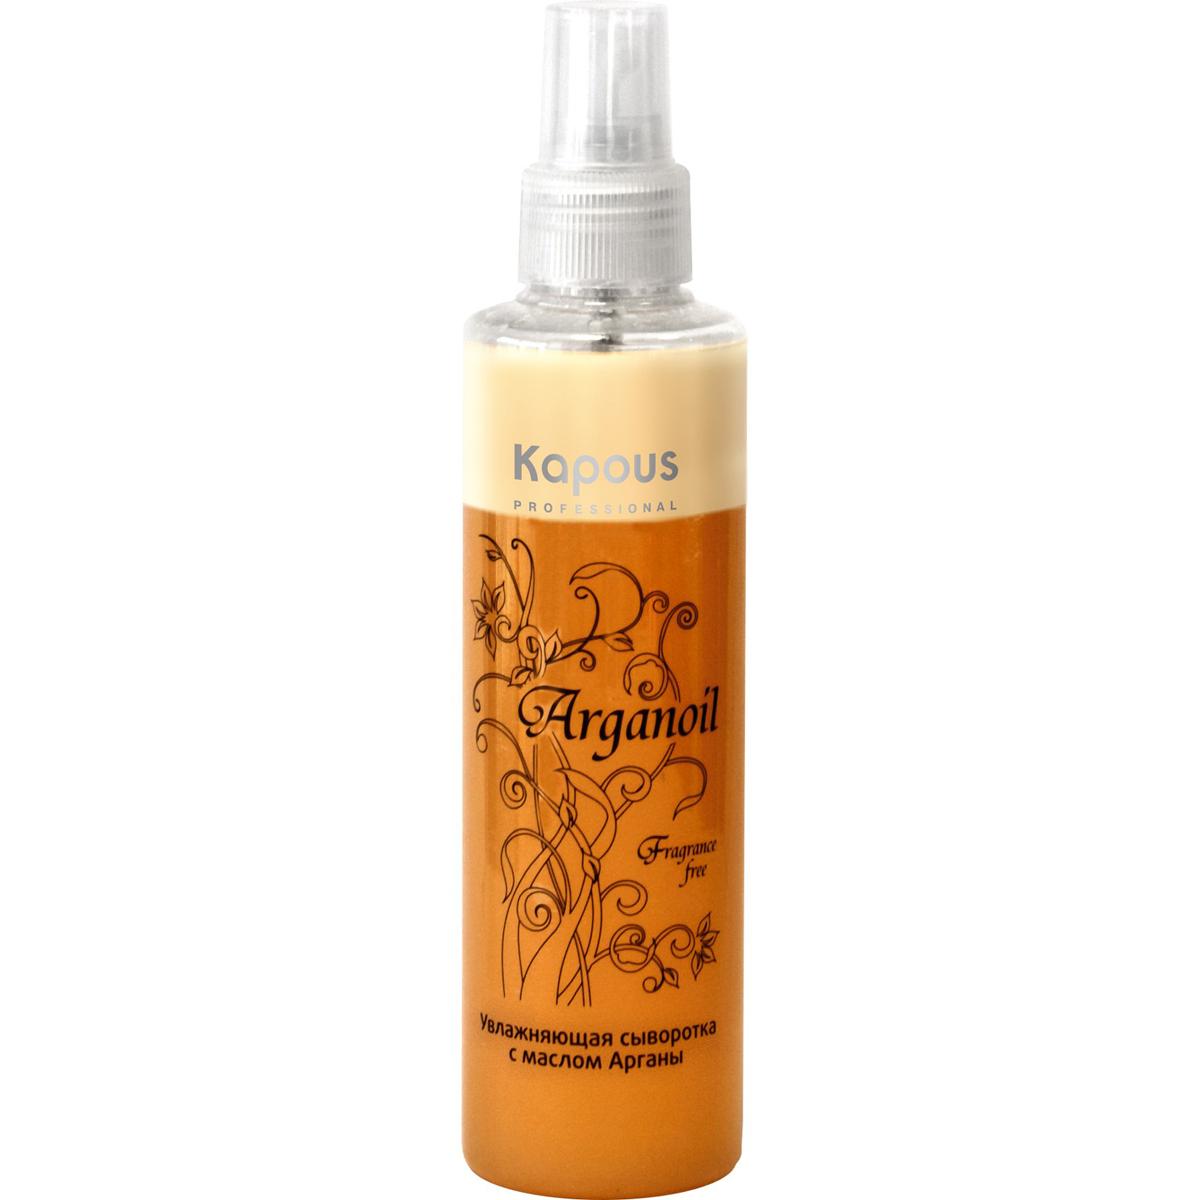 Kapous Увлажняющая сыворотка с маслом арганы Arganoil 200 мл kapous масло арганы для волос arganoil 200 мл